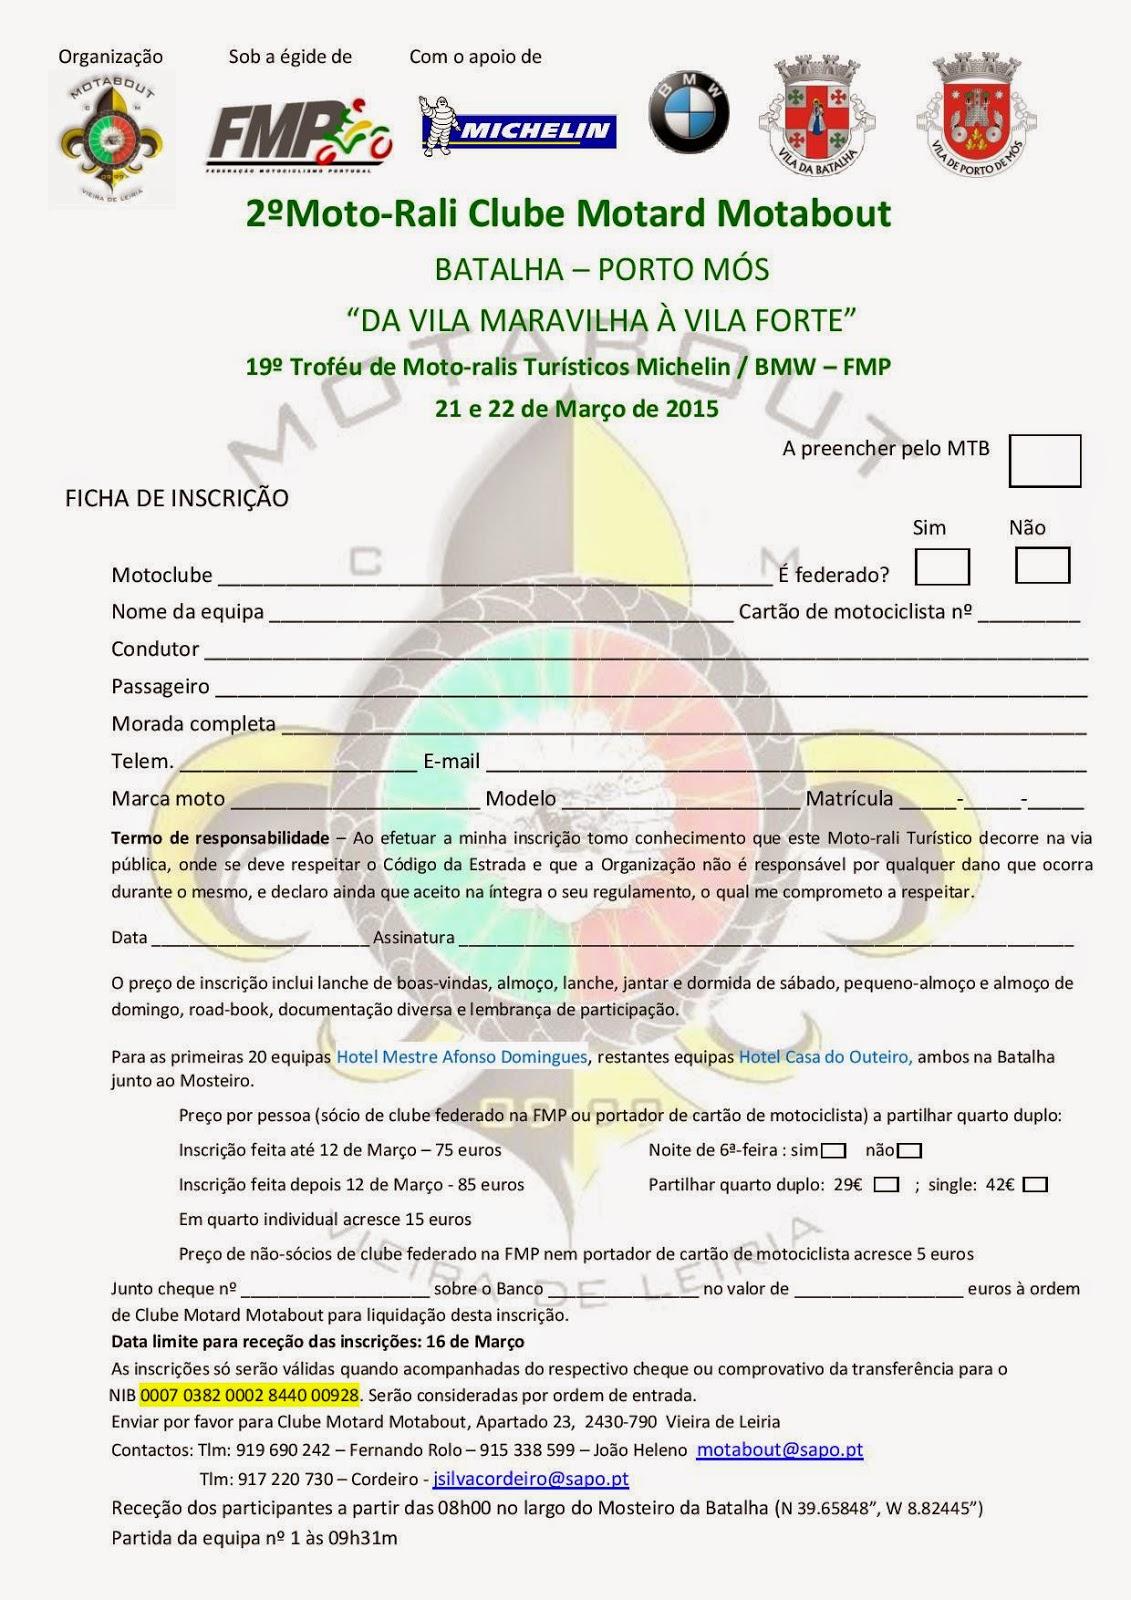 2º Moto-Rali Turístico C.M.Motabout - 21-22/03/2015 Ficha_Inscricao_Moto_Rali_Motabout_2015-page-001